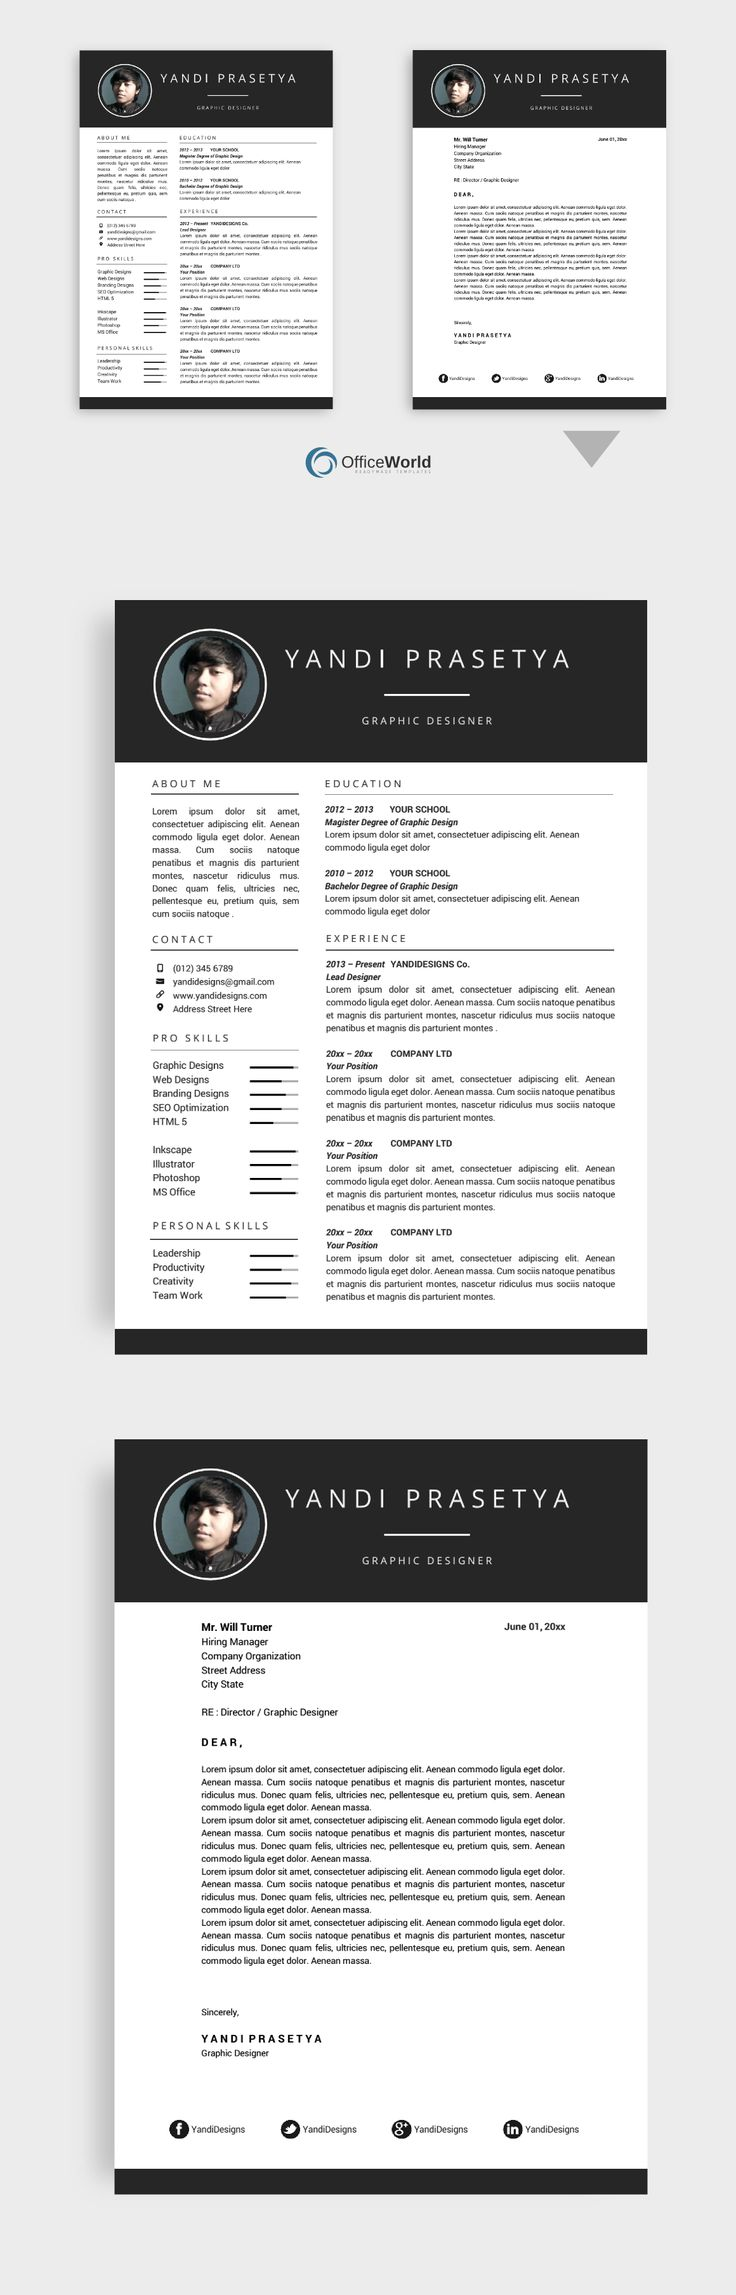 25 unique cover sheet for resume ideas on pinterest best resume